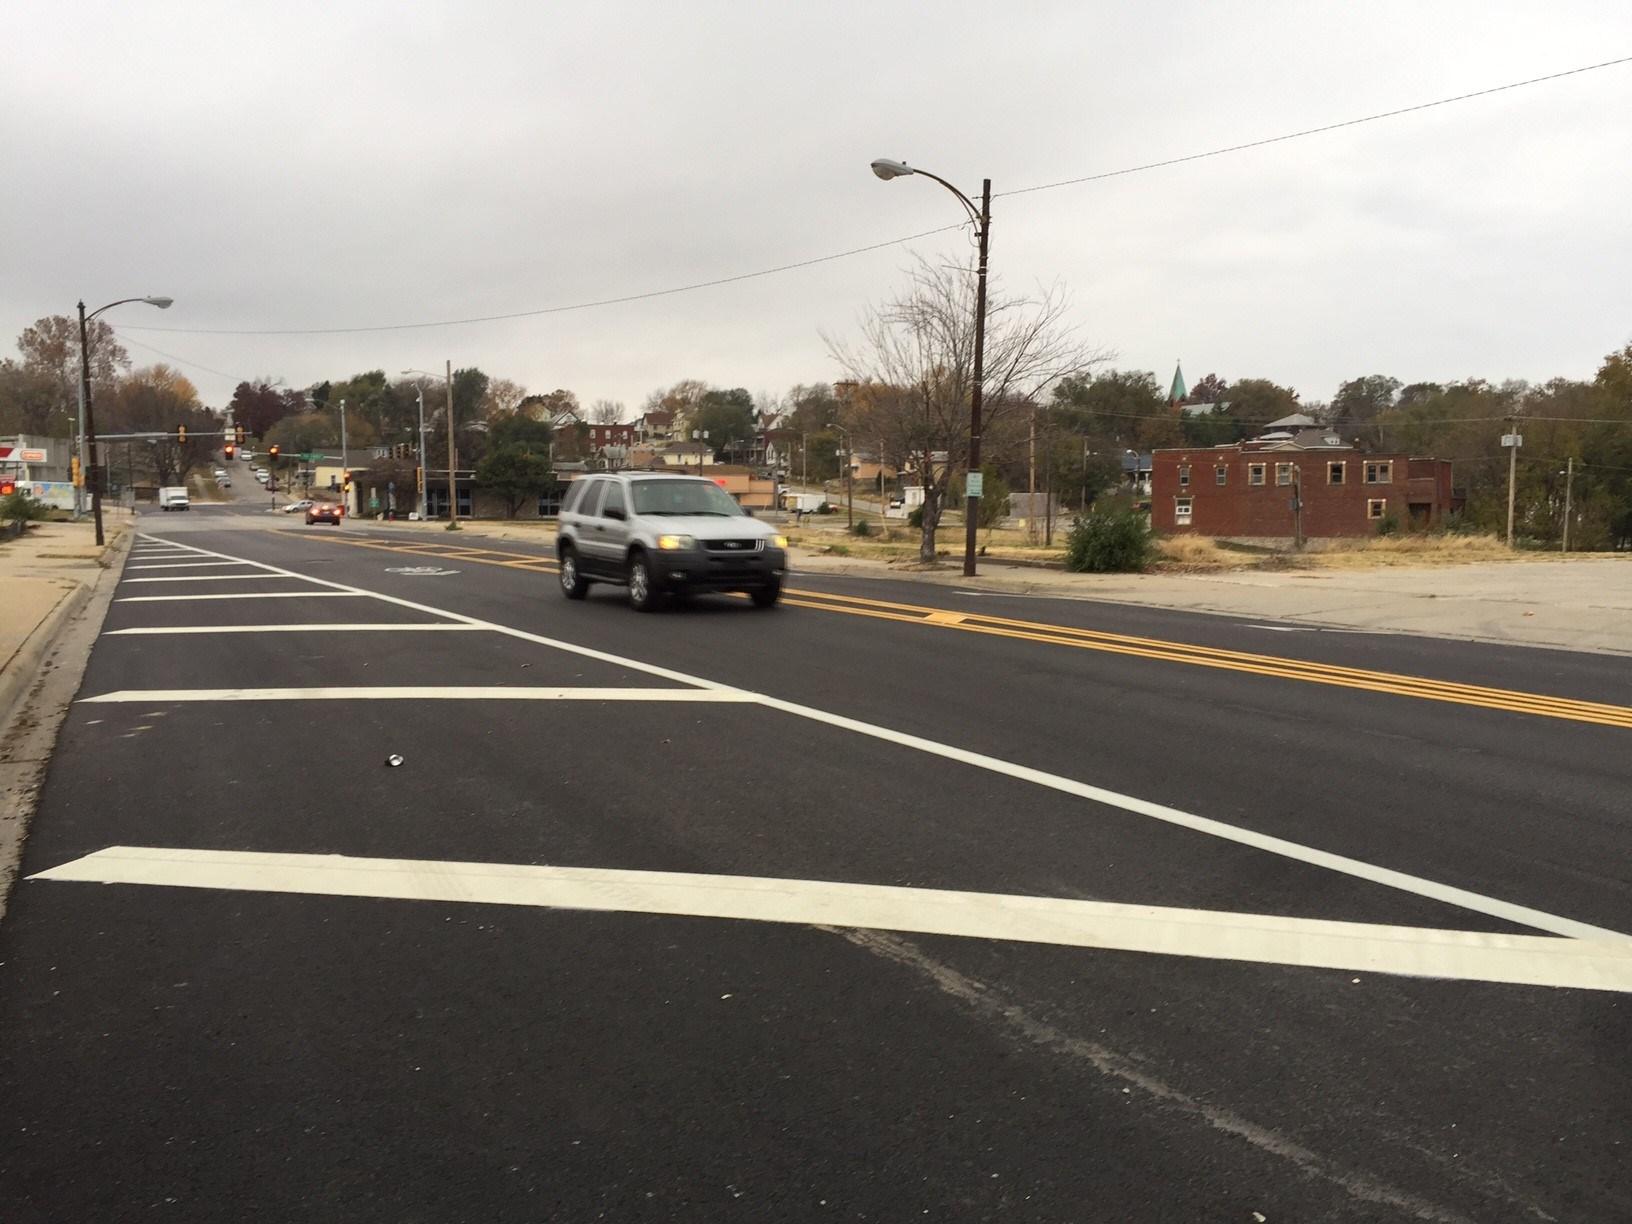 A man was found shot dead outside on the sidewalk. (Jeff Roberts/KCTV)